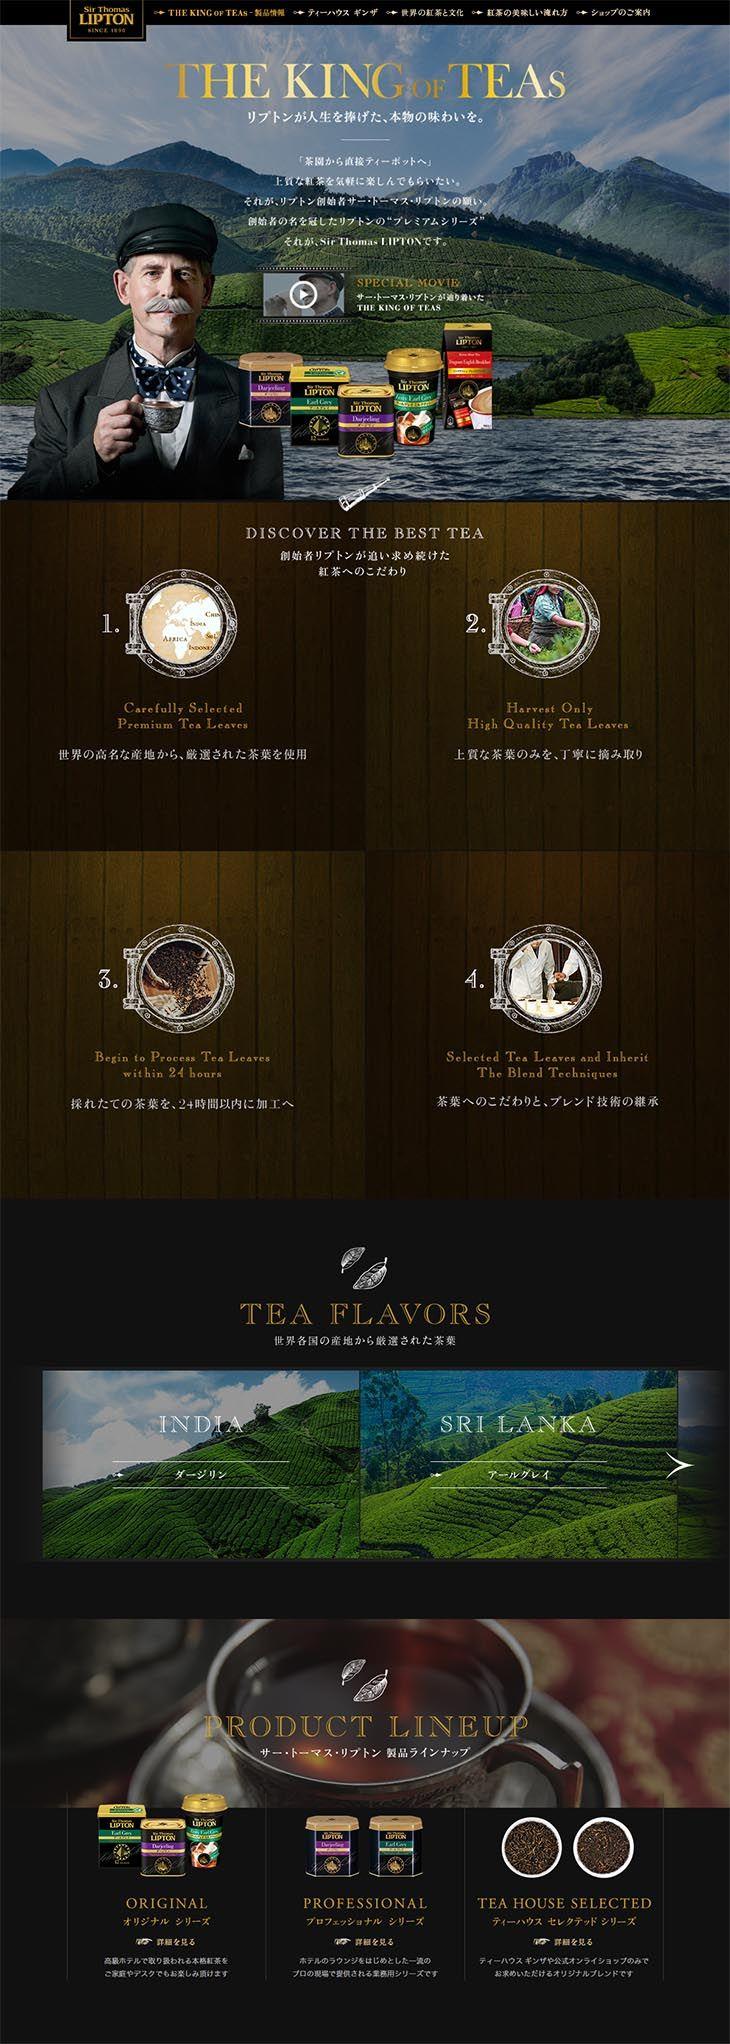 THE KING OF TEAS